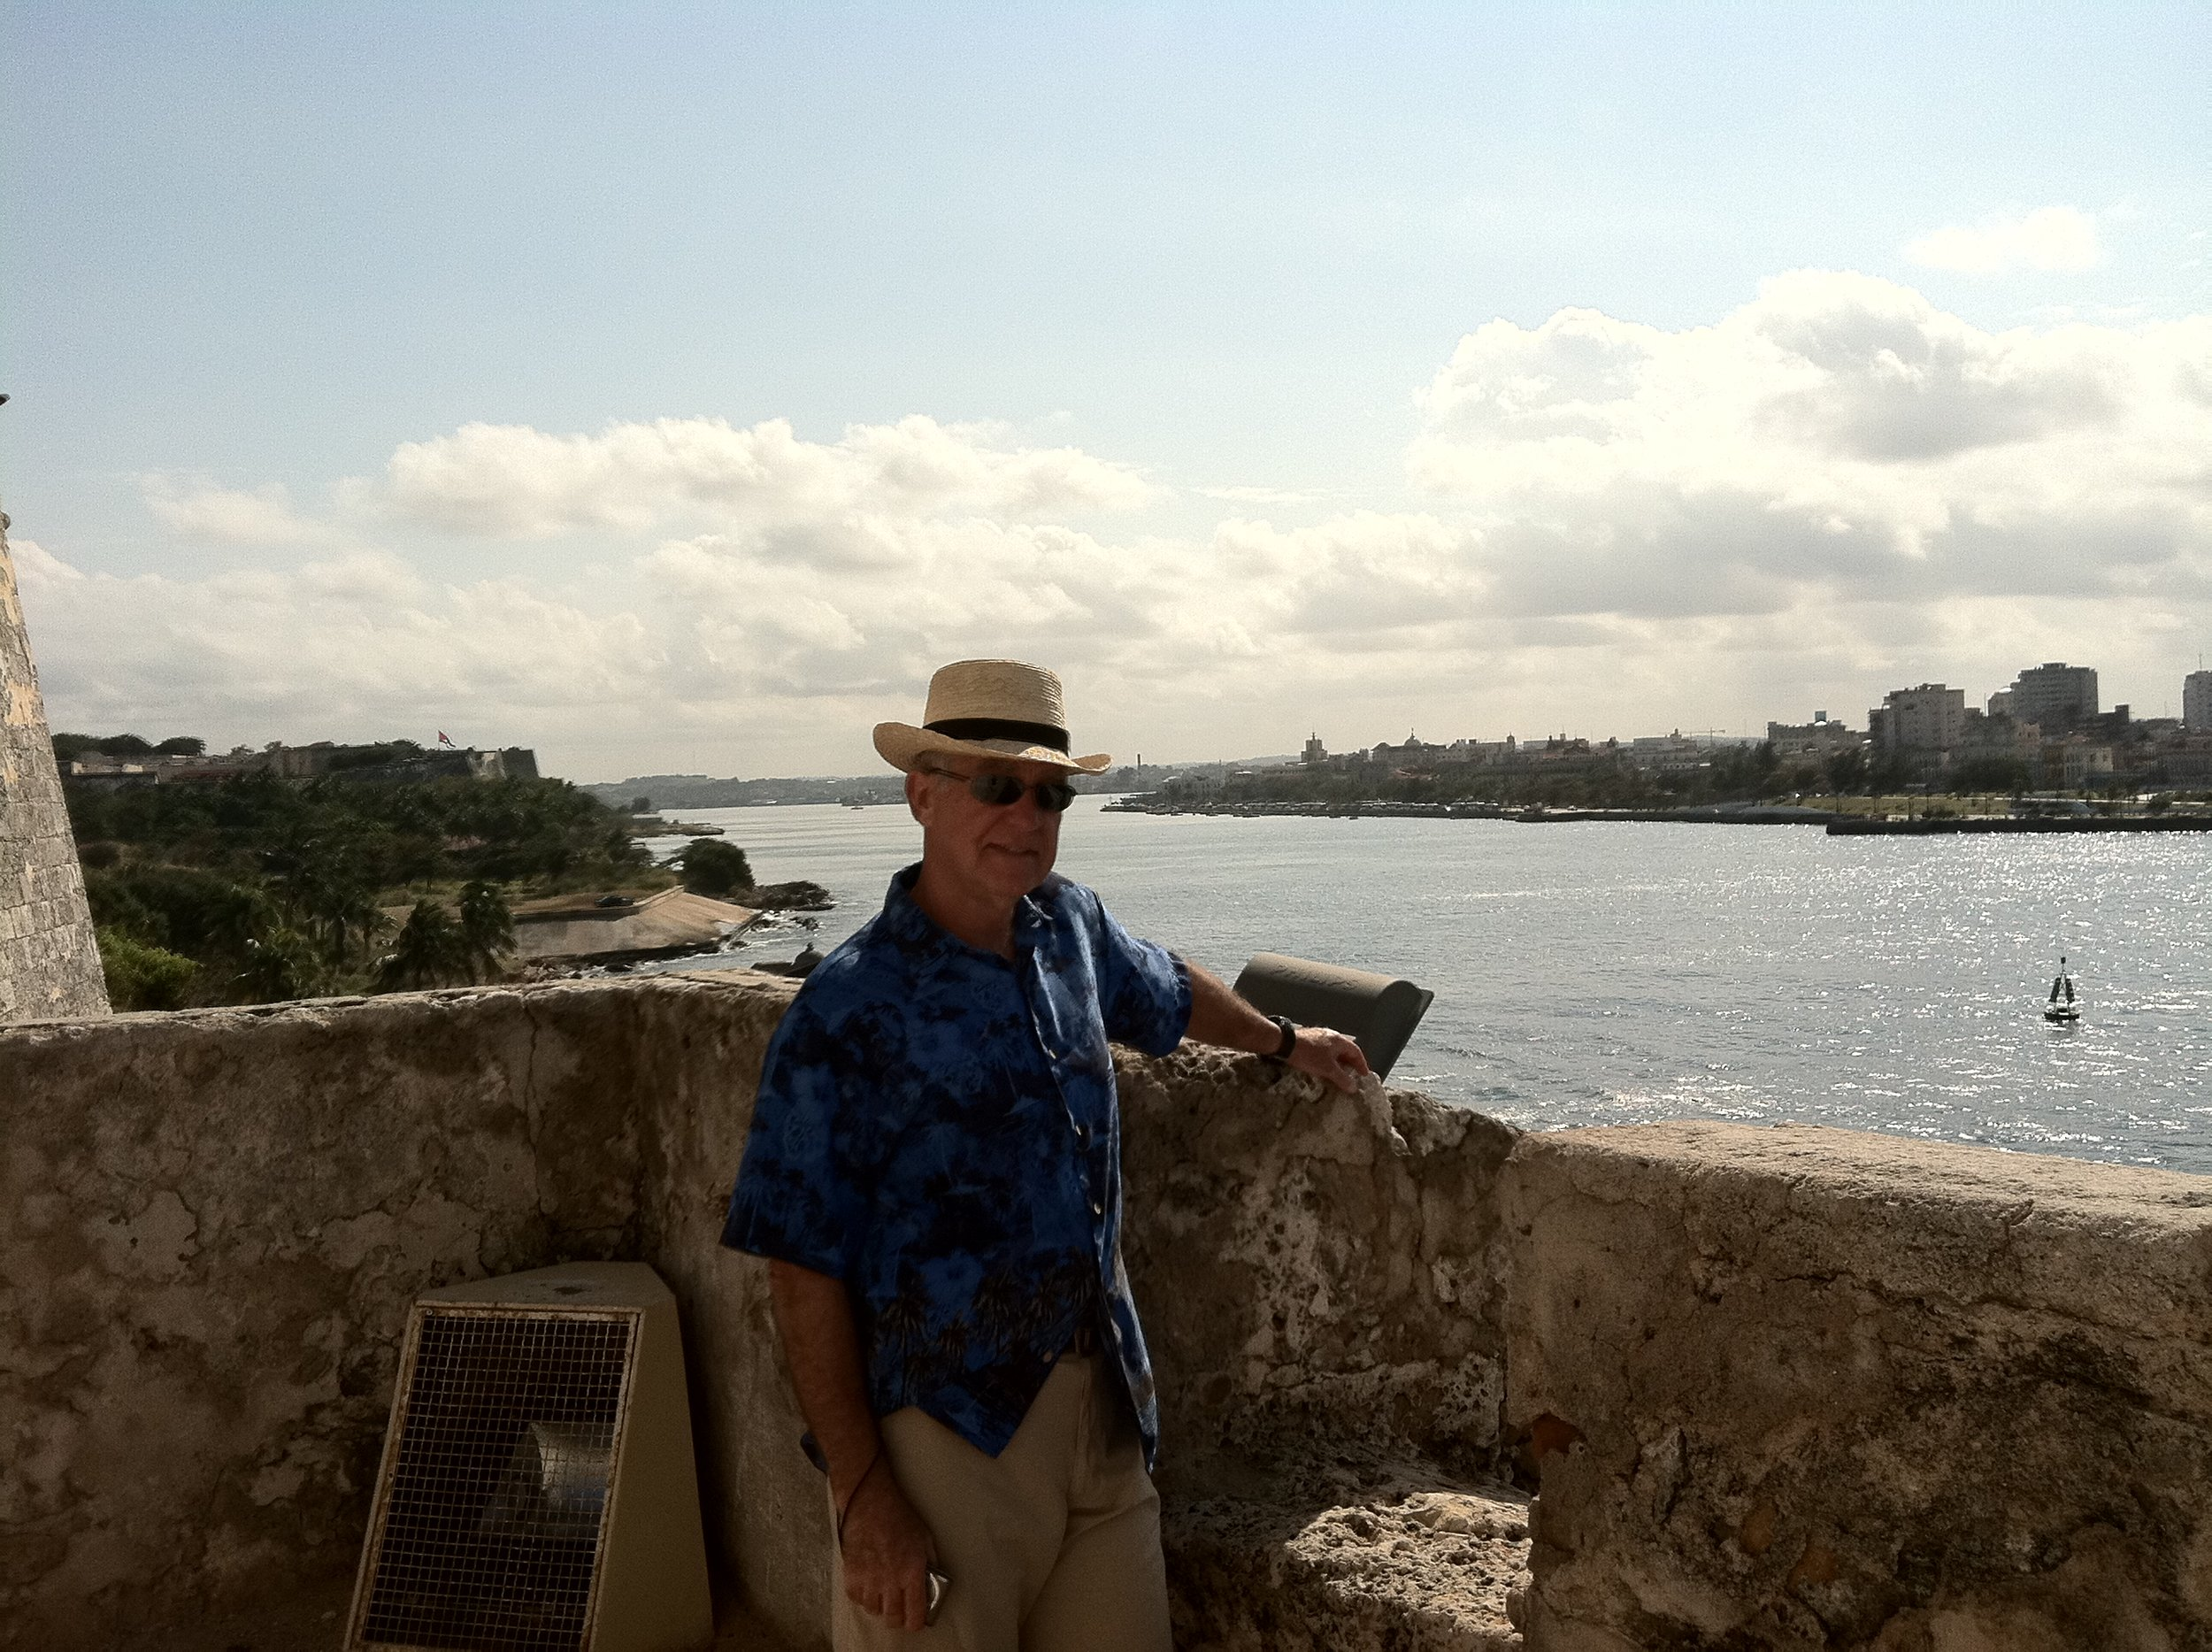 Mari Guas in Cuba after 50 years